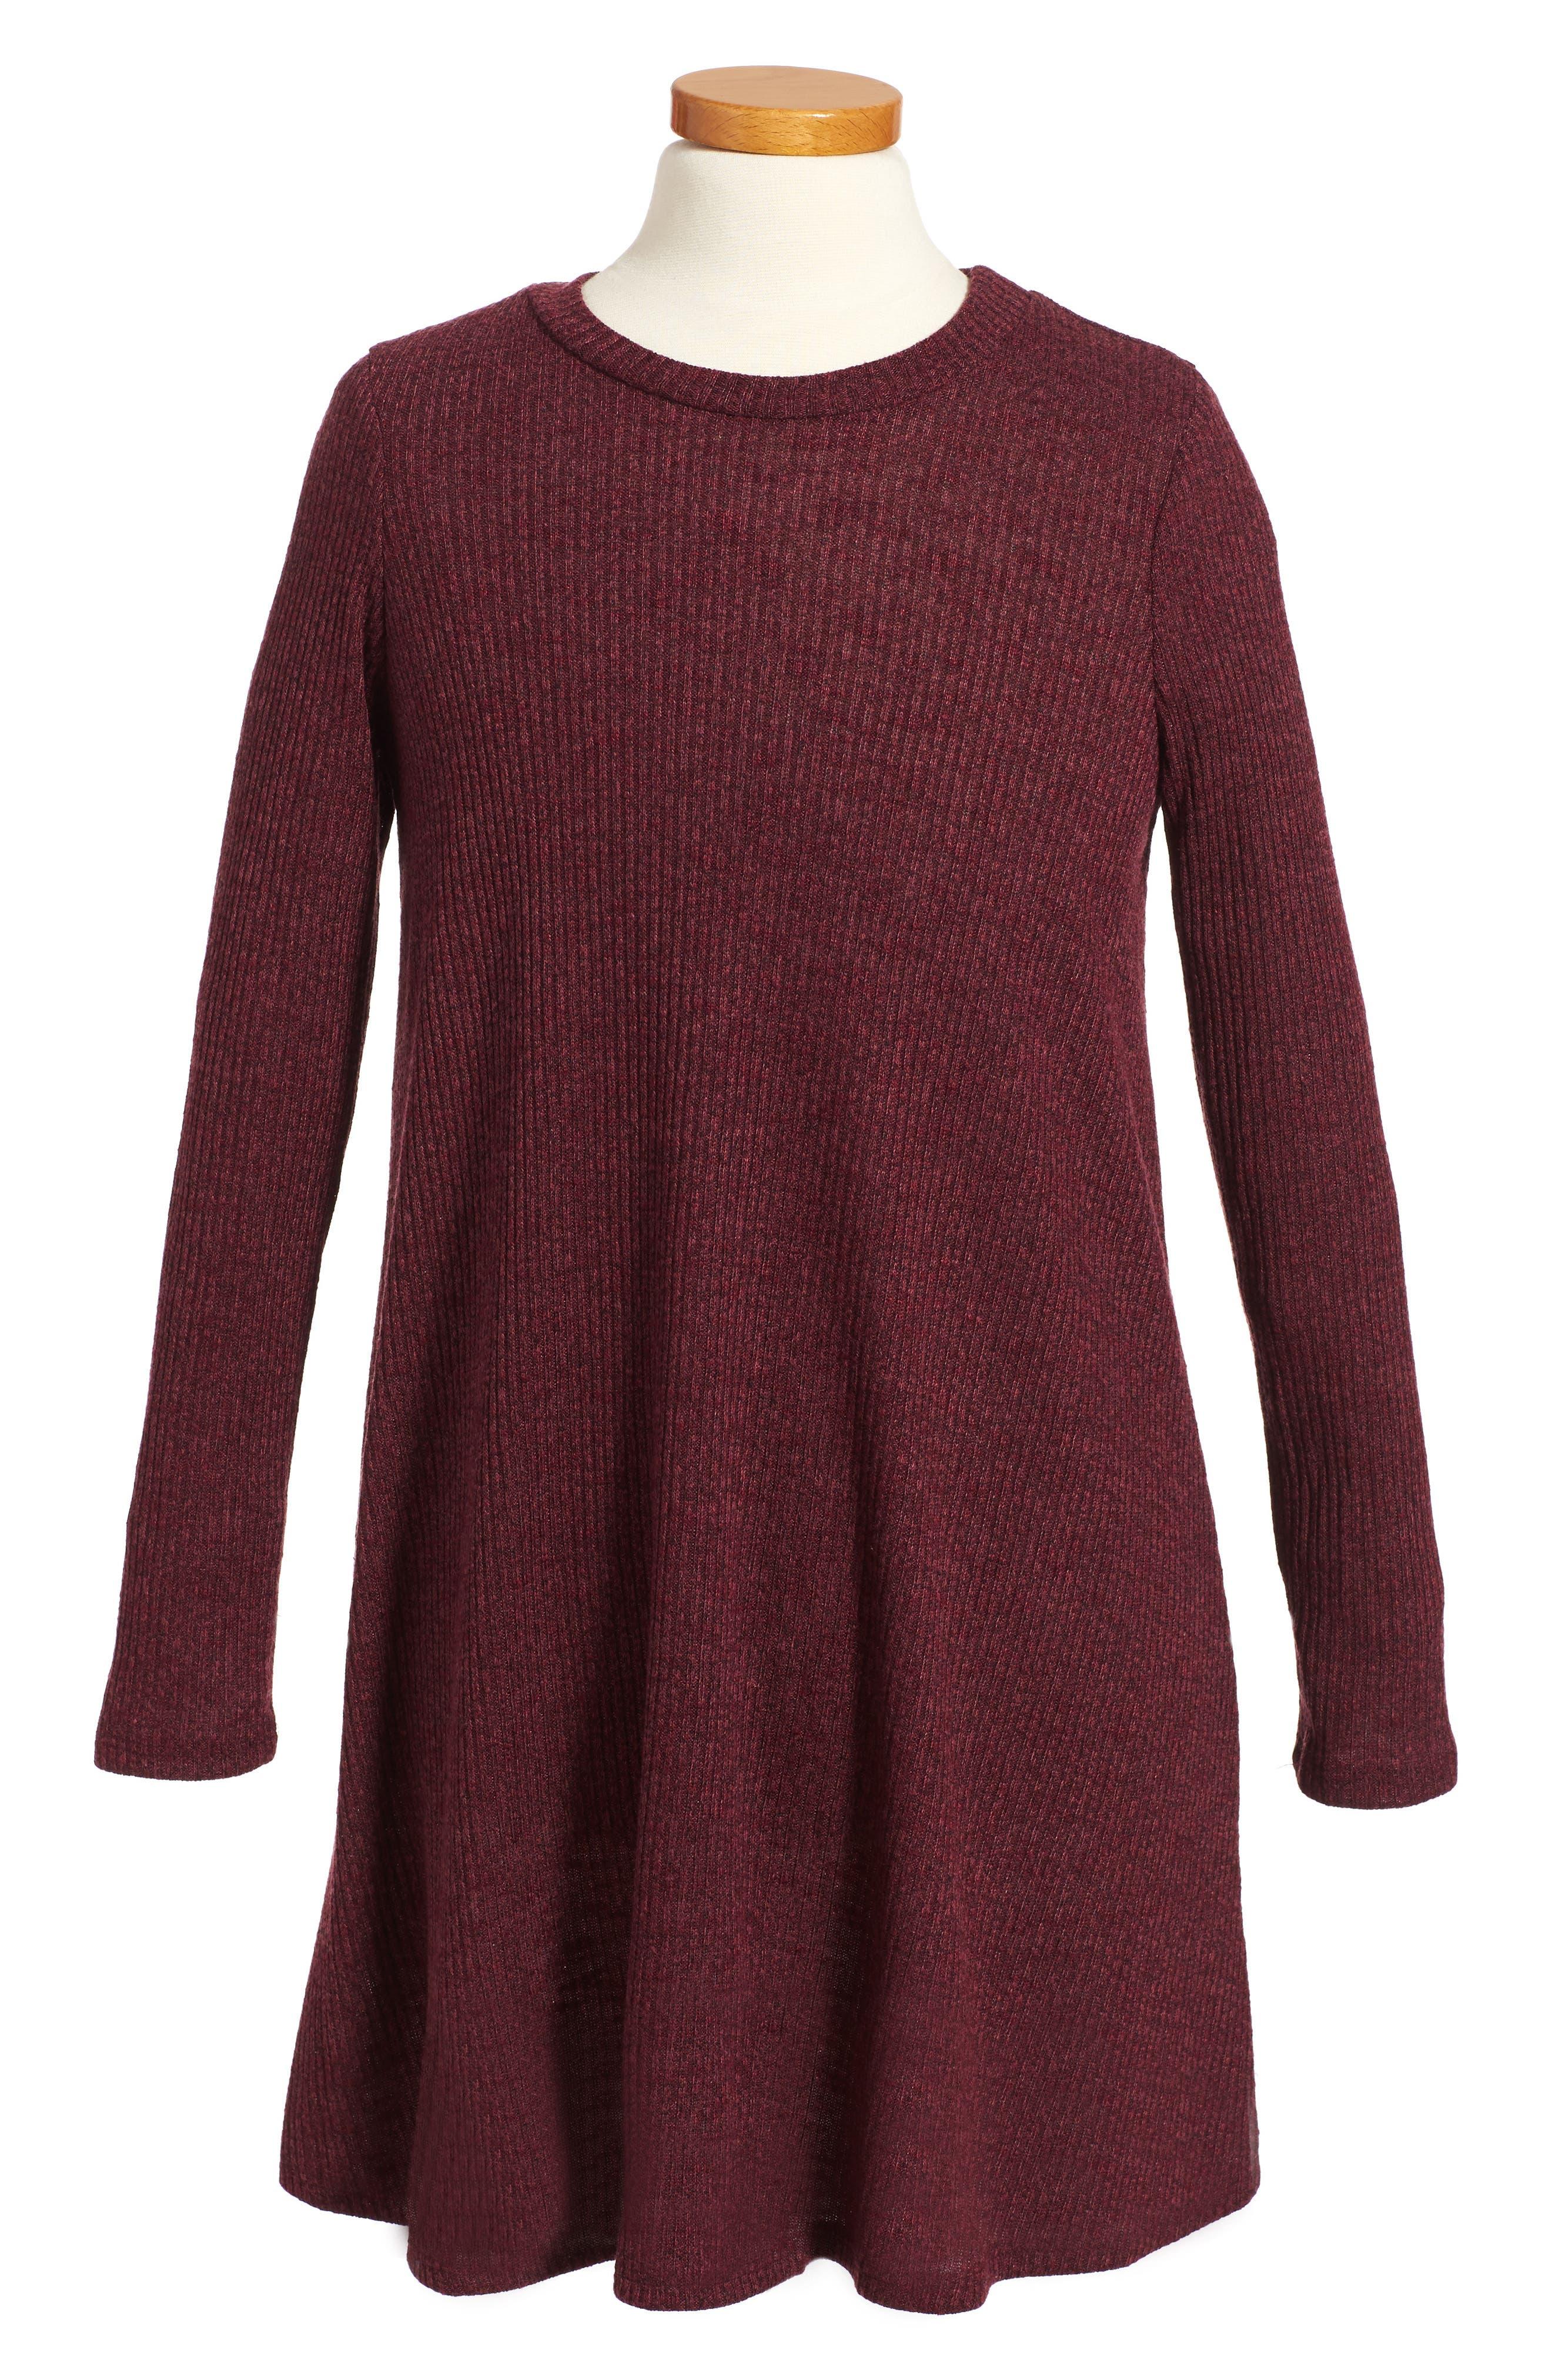 Rib Knit Sweater Dress,                             Main thumbnail 1, color,                             004 Wine